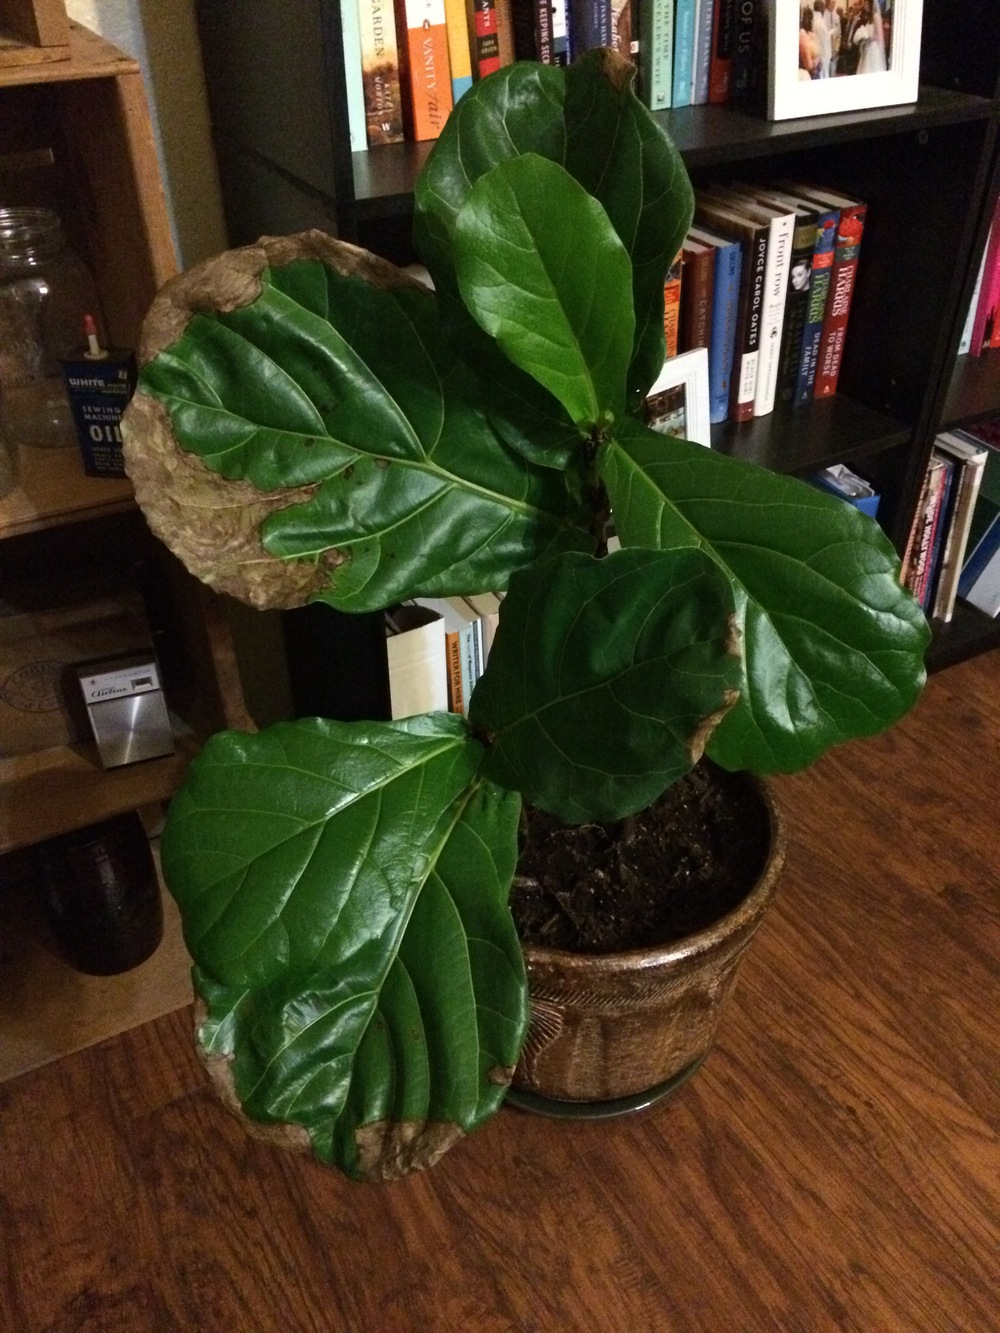 Ferdinand the Fiddle Leaf Fig Tree